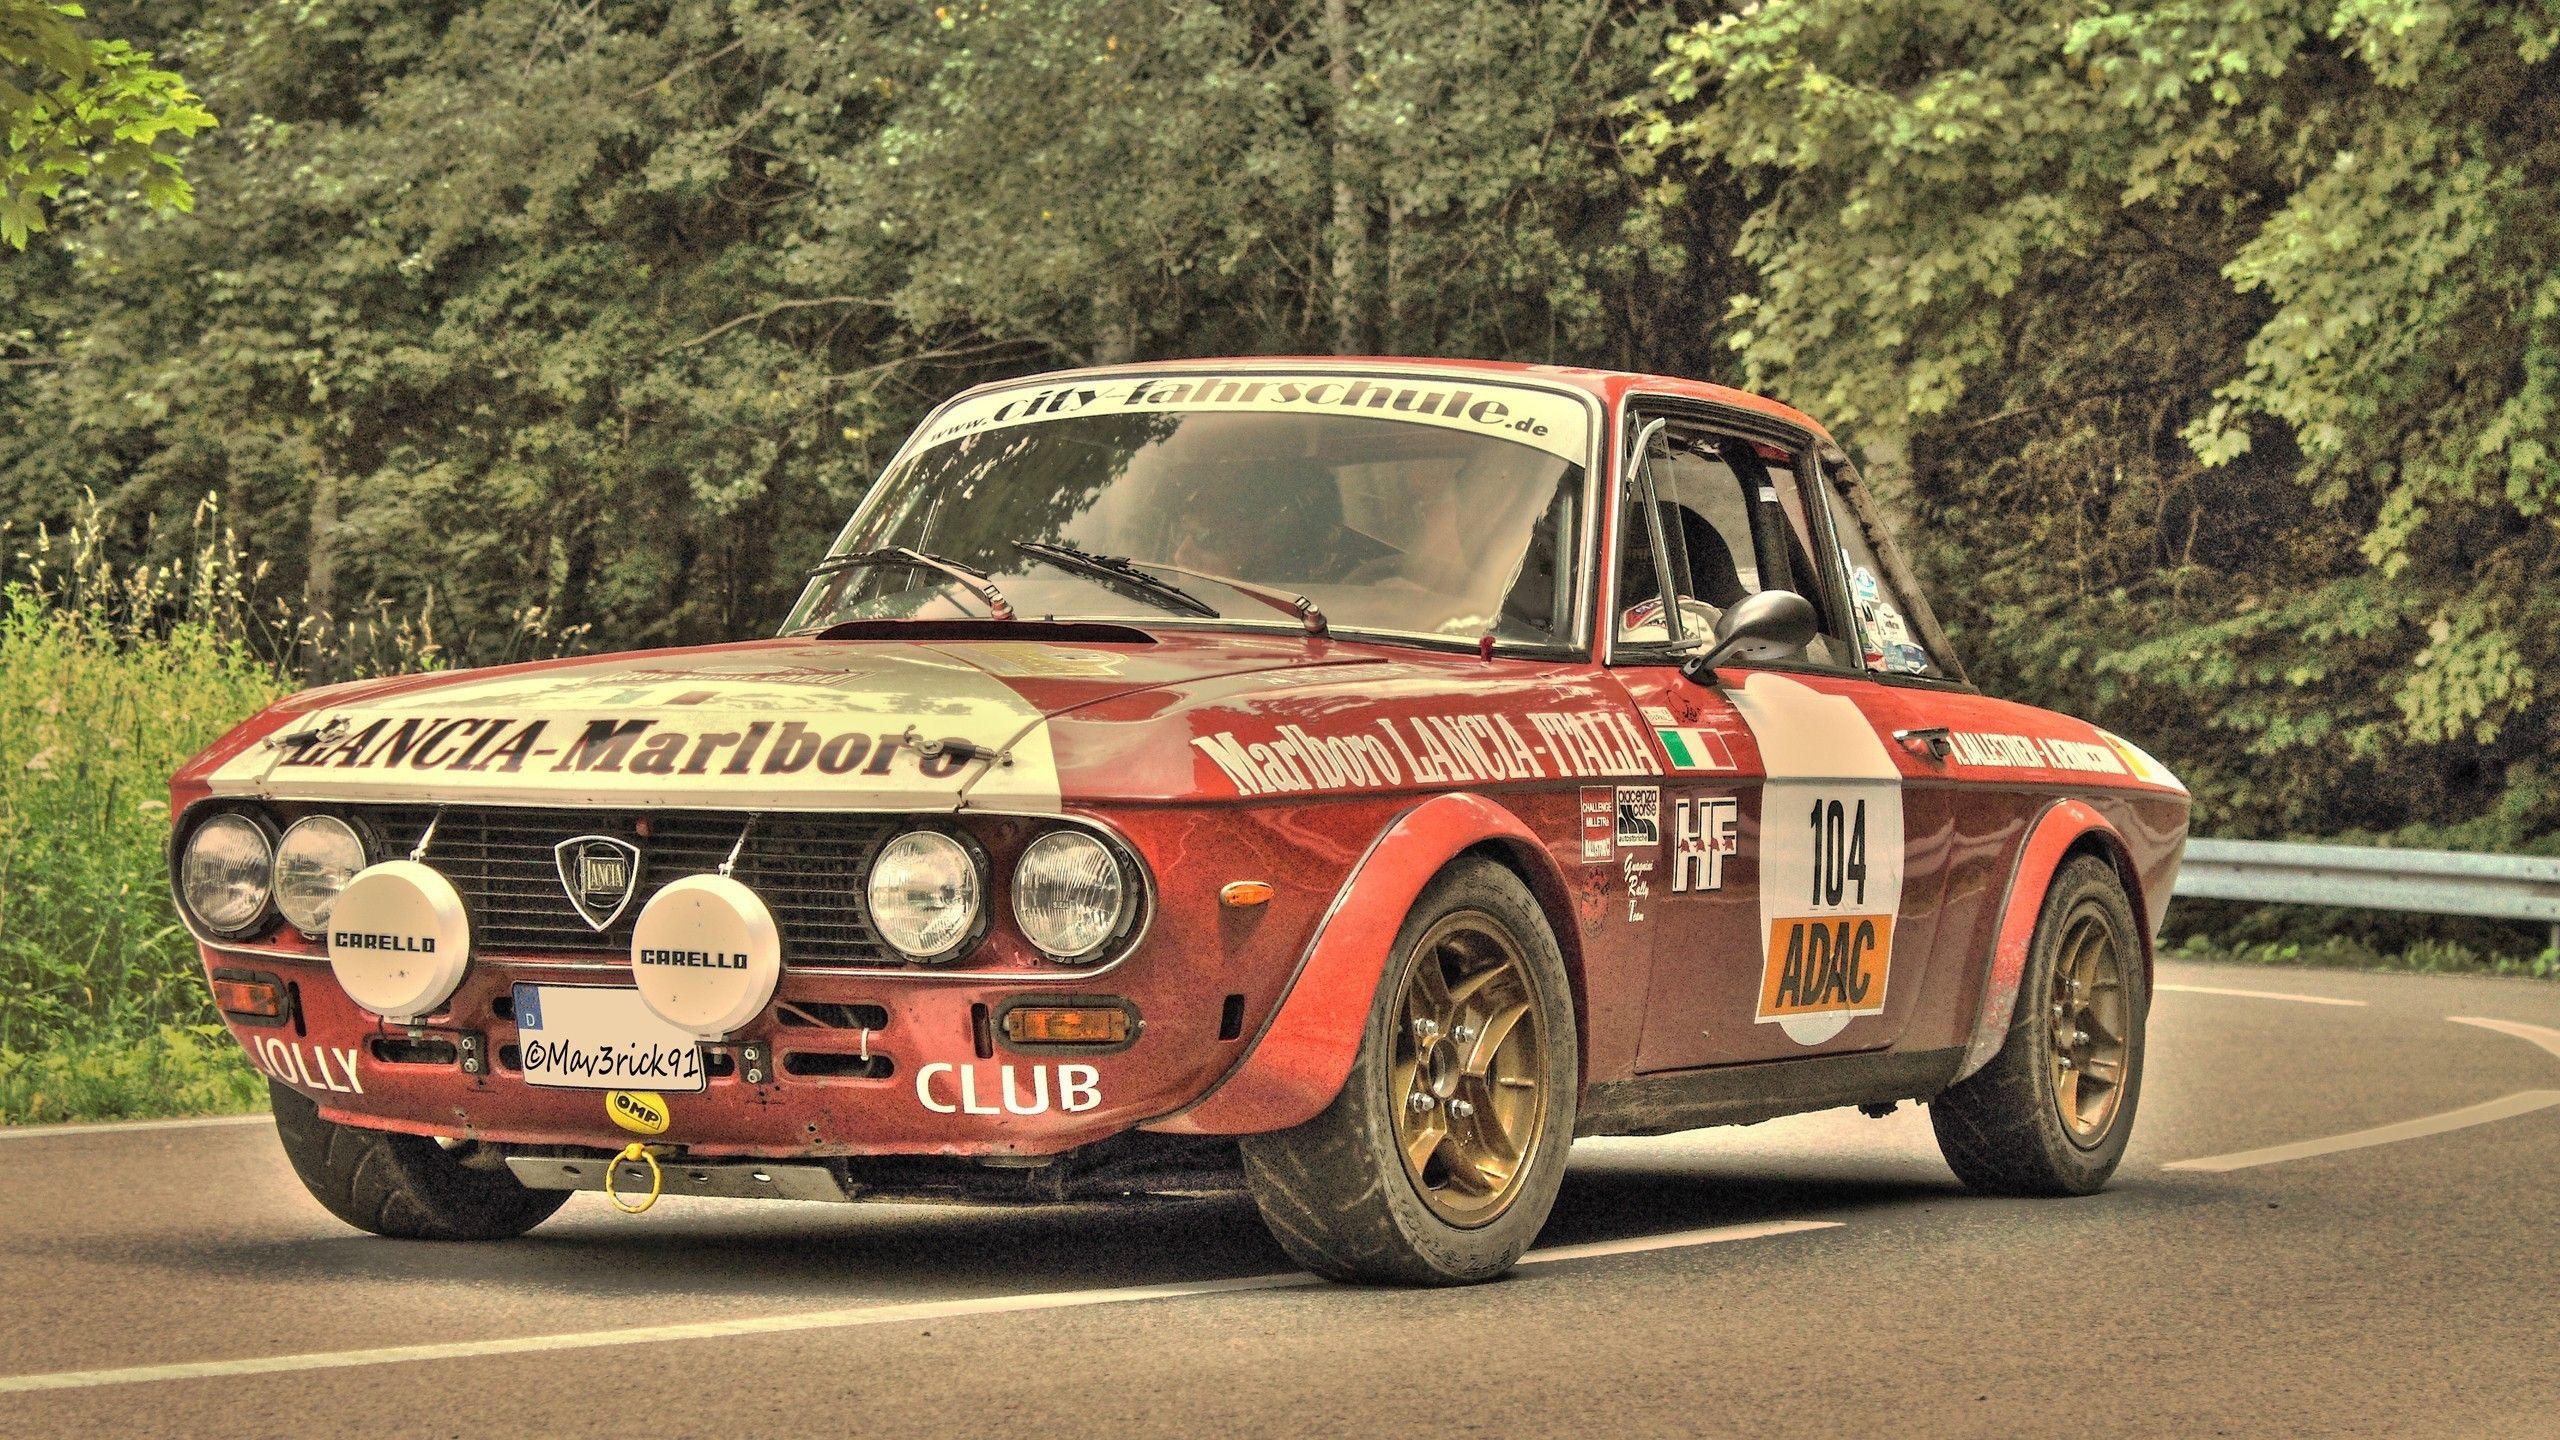 Lancia Rallye Classic Cars Motorsports Racing Wallpaper Classic Cars Motorsport Antique Cars